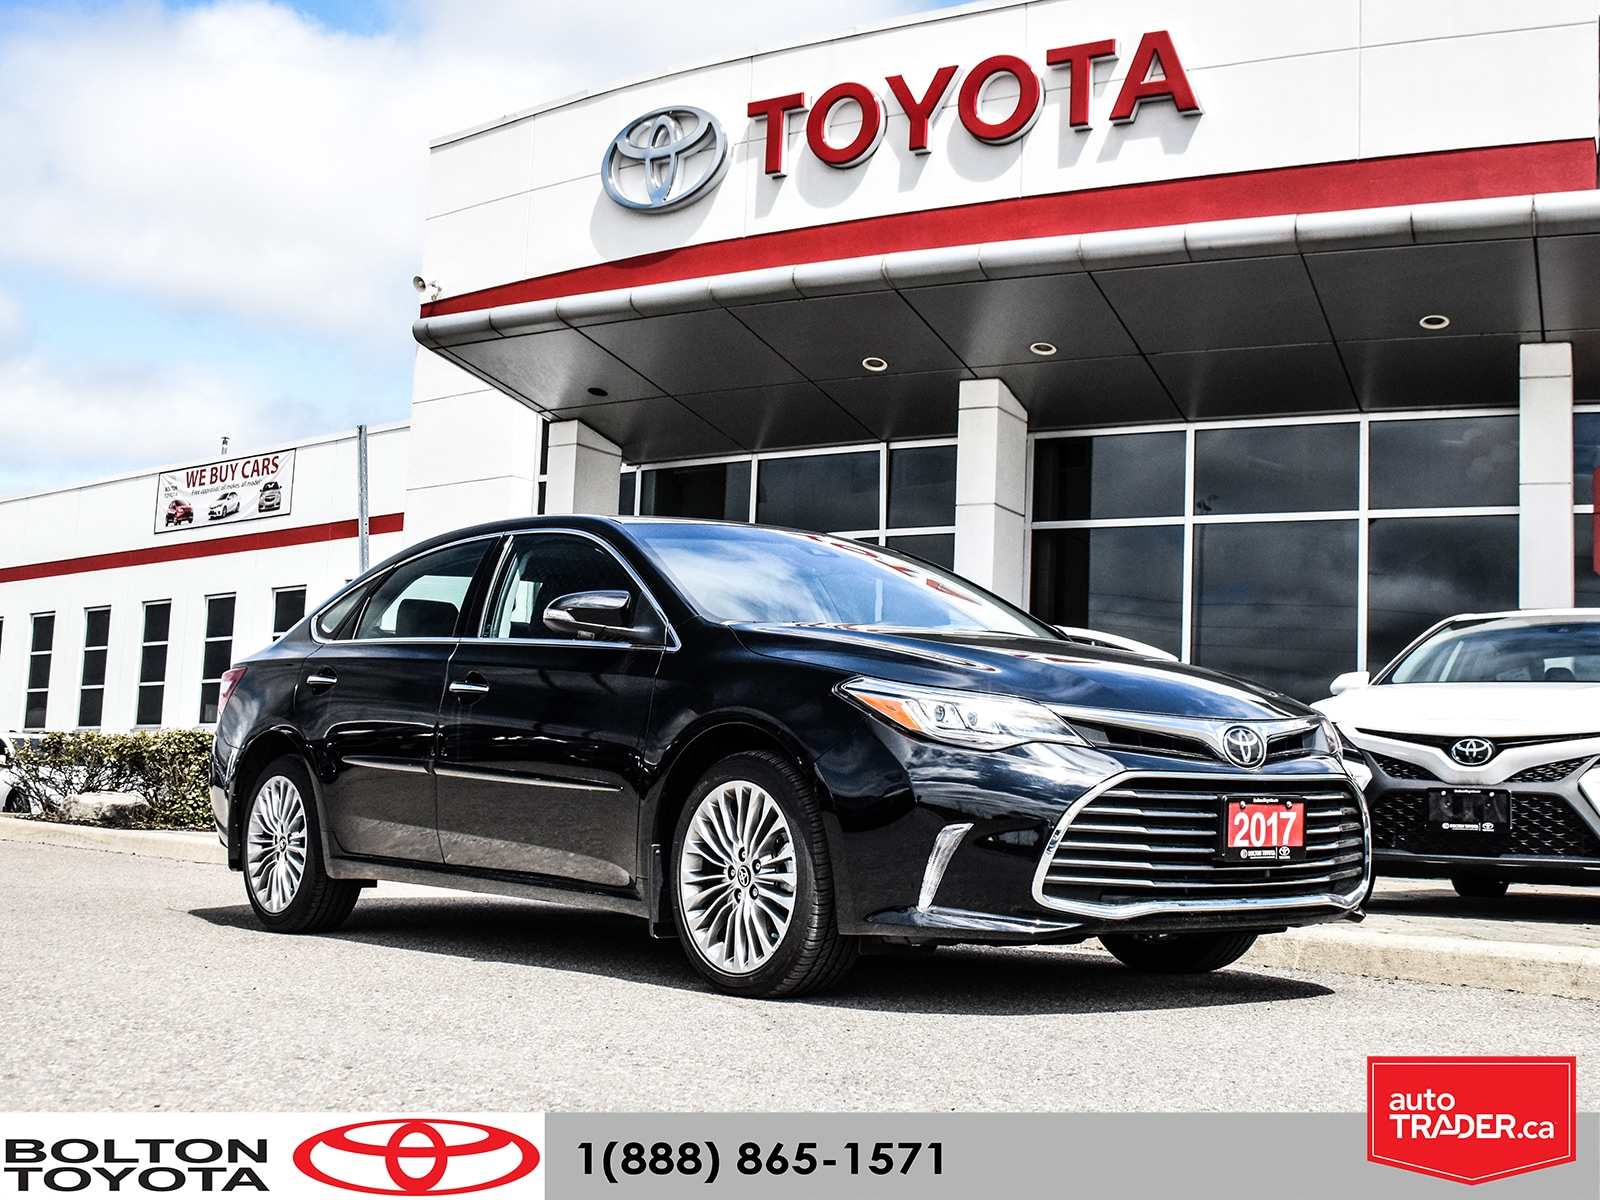 2017 Toyota Avalon Limited|No Accident|LOW KM|Navigation Berline